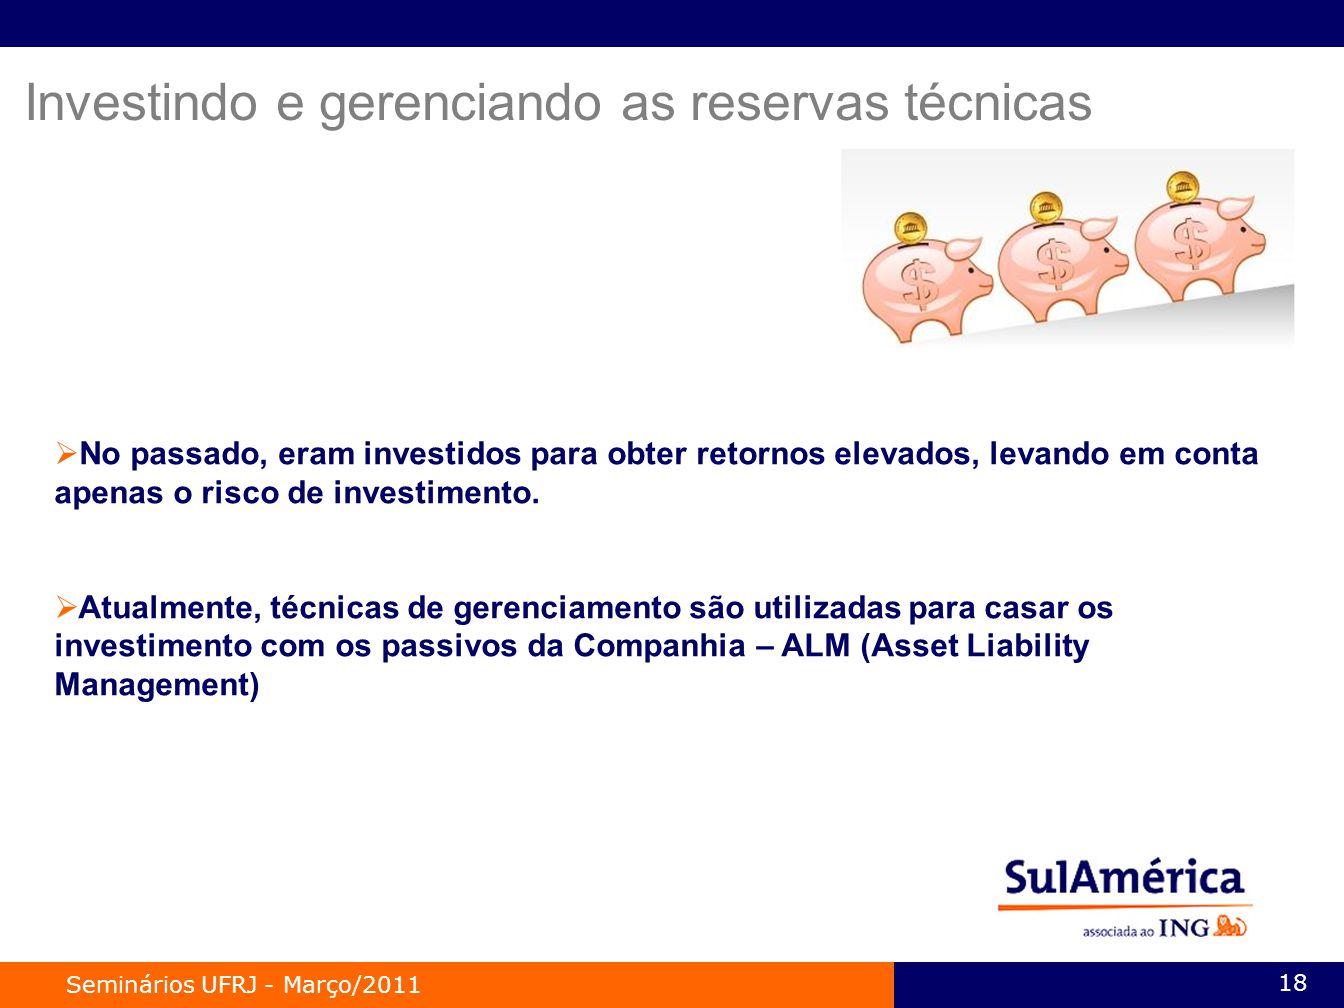 Investindo e gerenciando as reservas técnicas